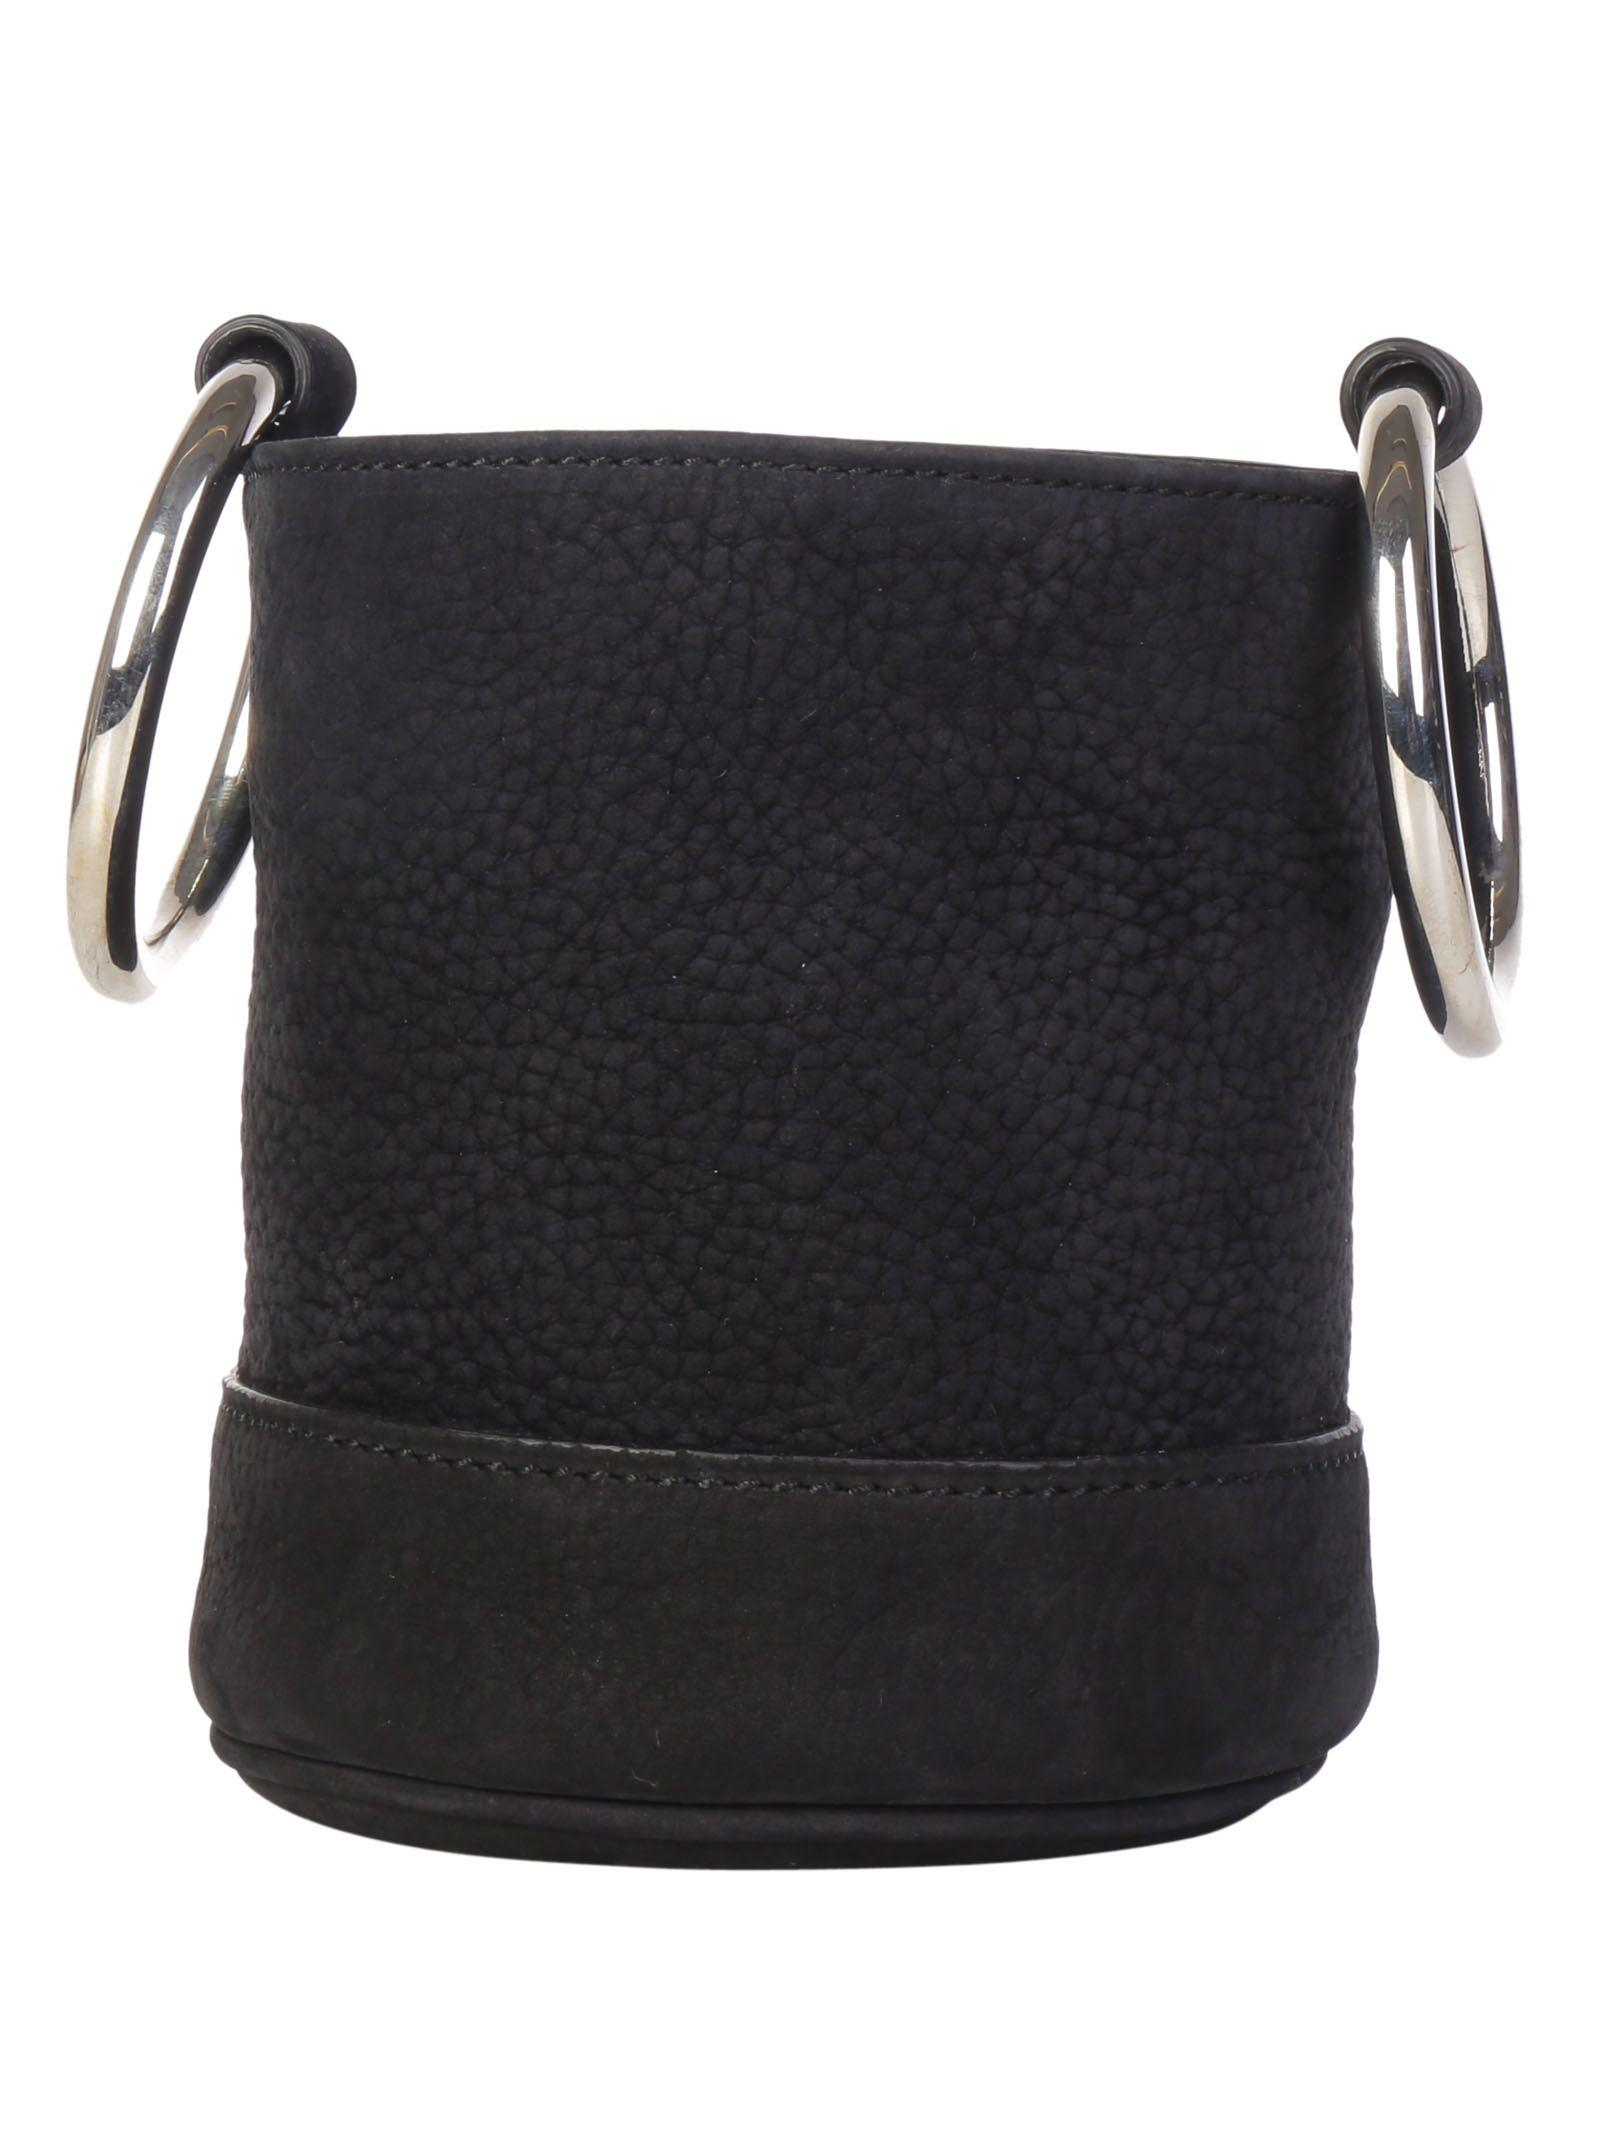 Simon Miller Bonsai Handbag In Black